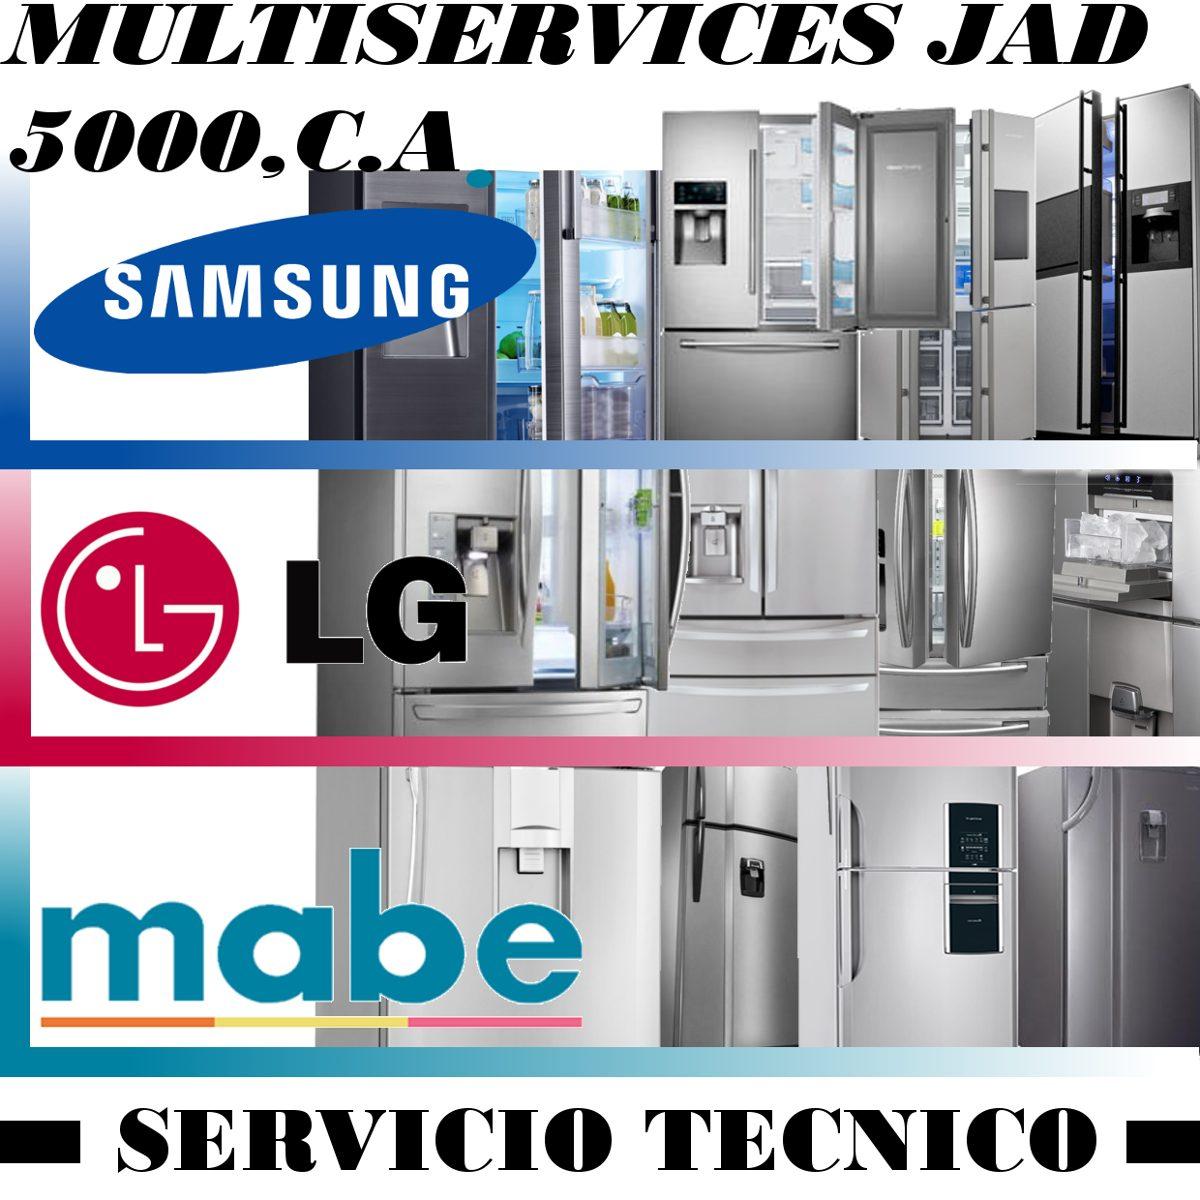 Servicio t cnico autorizado de nevera samsung lg mabe en for Servicio tecnico grohe